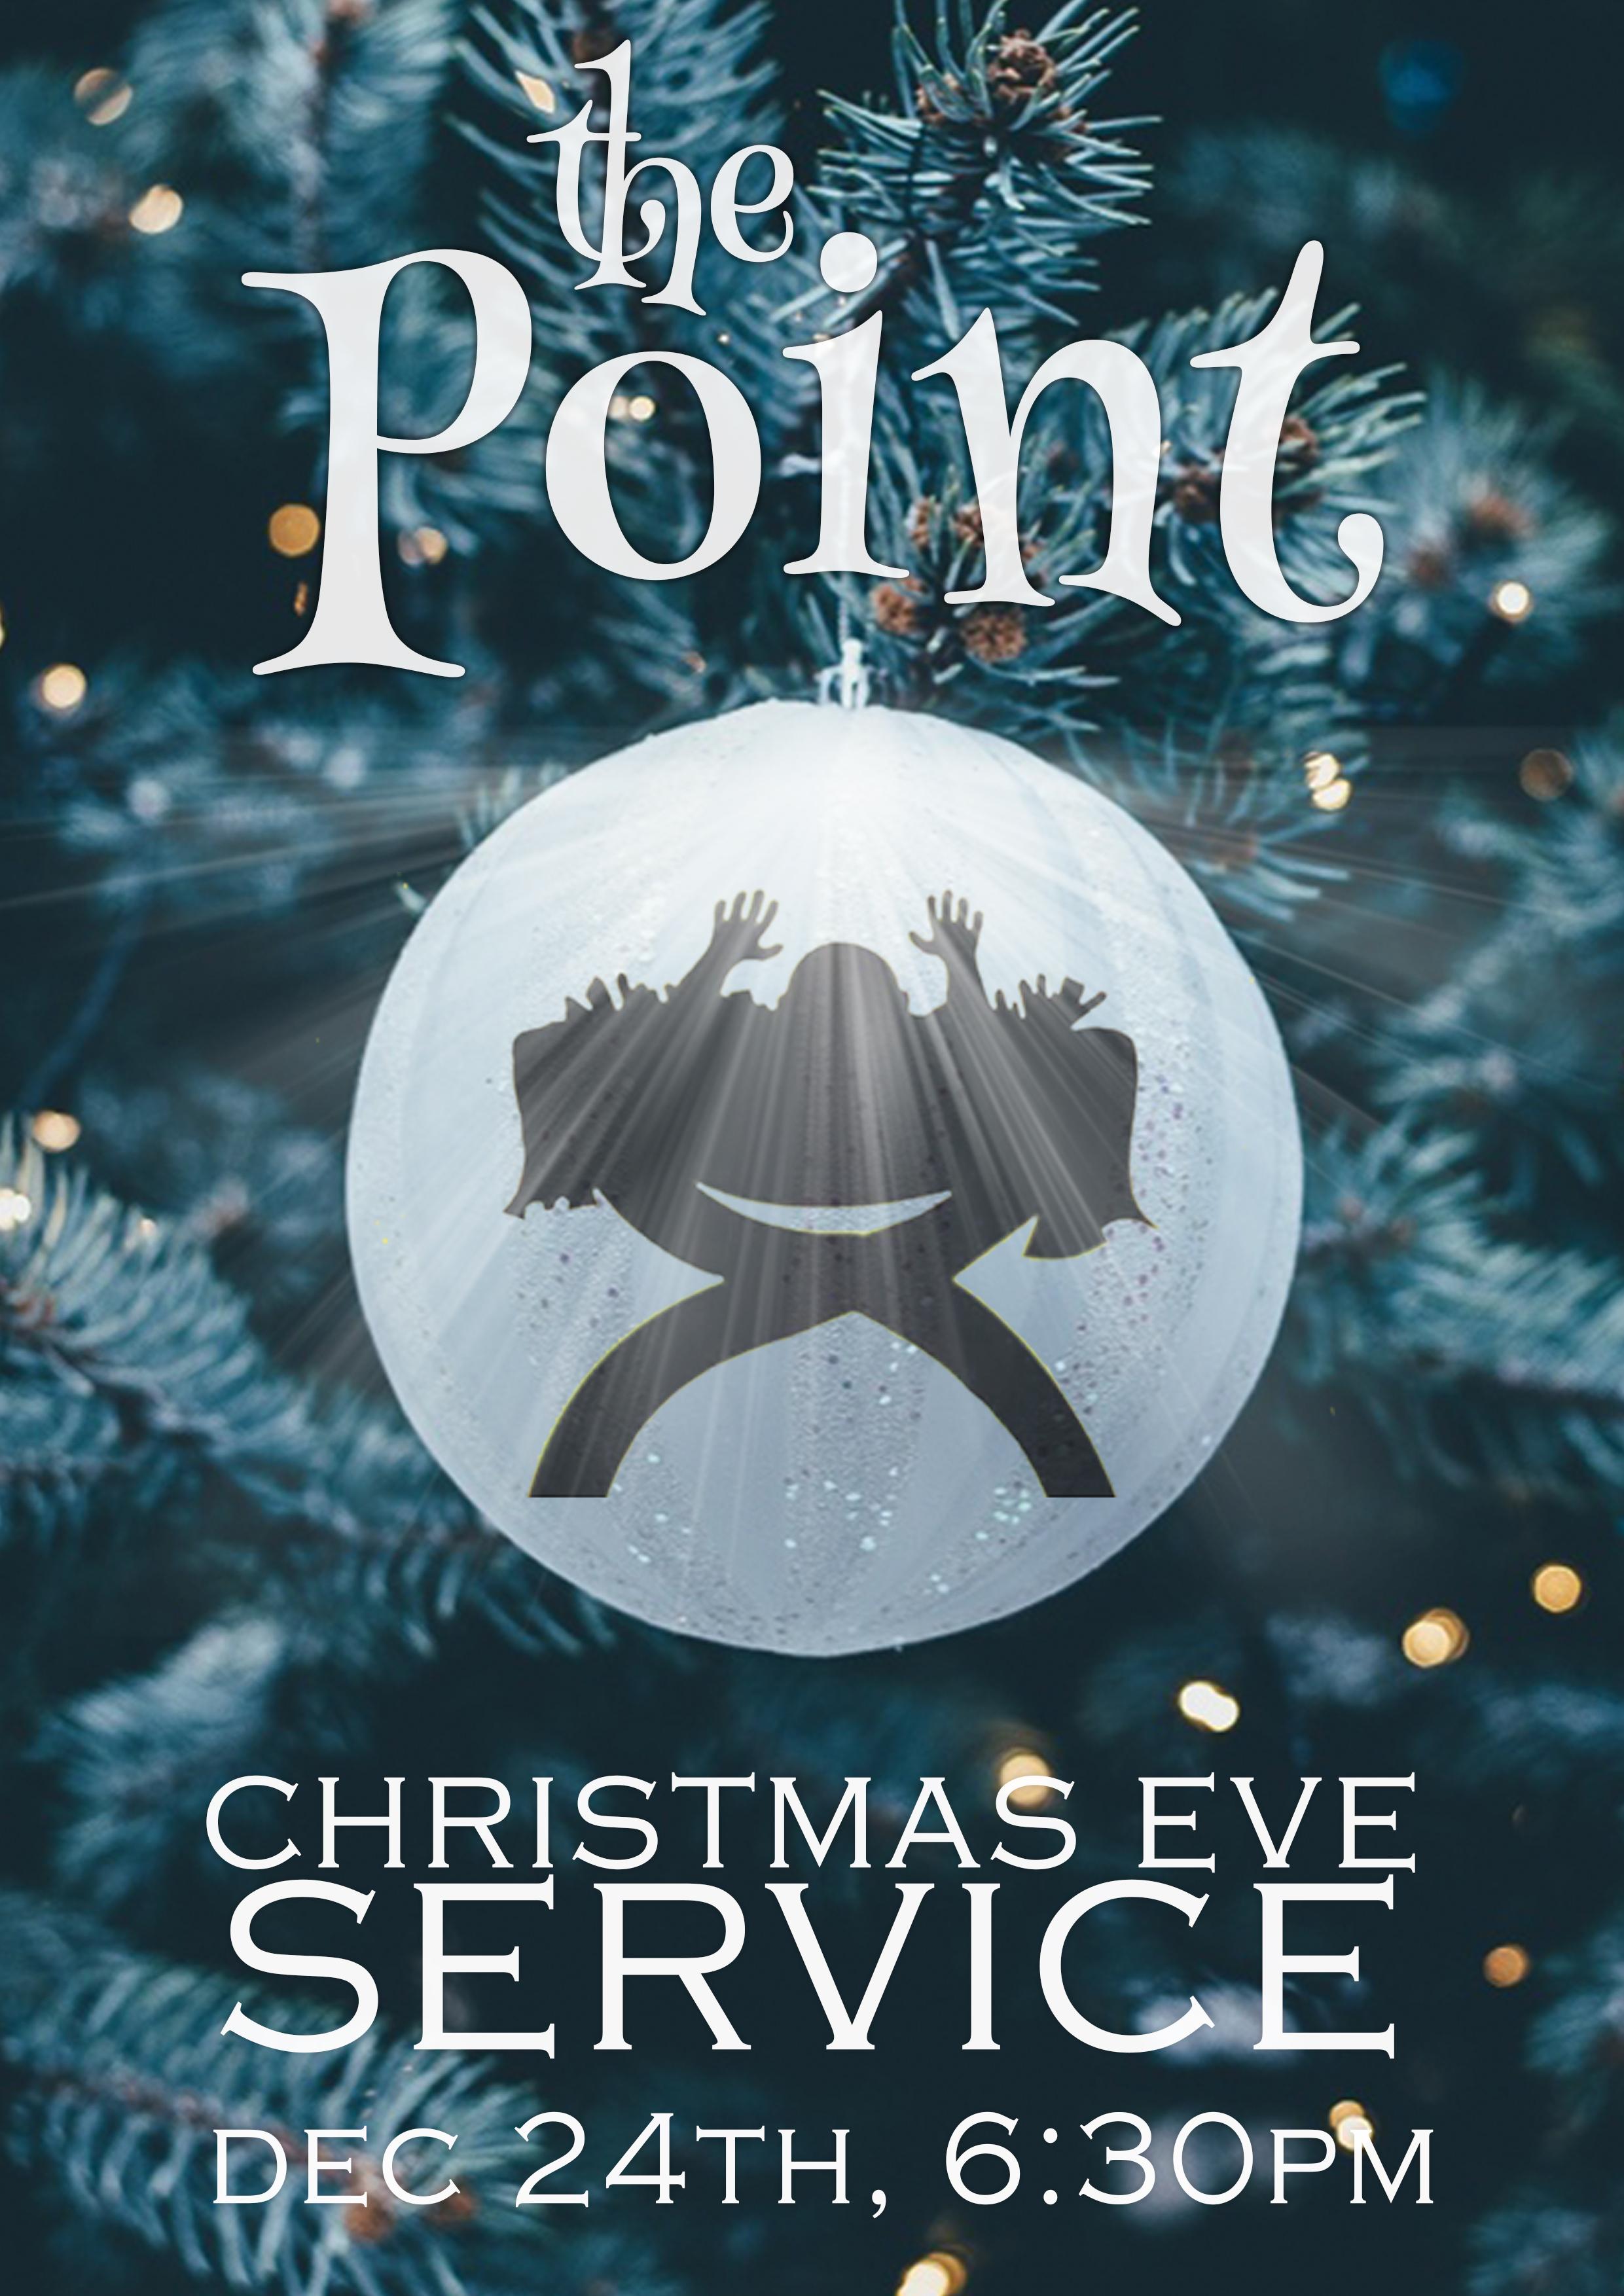 Christmas Eve 2018 Service Poster Size.jpg